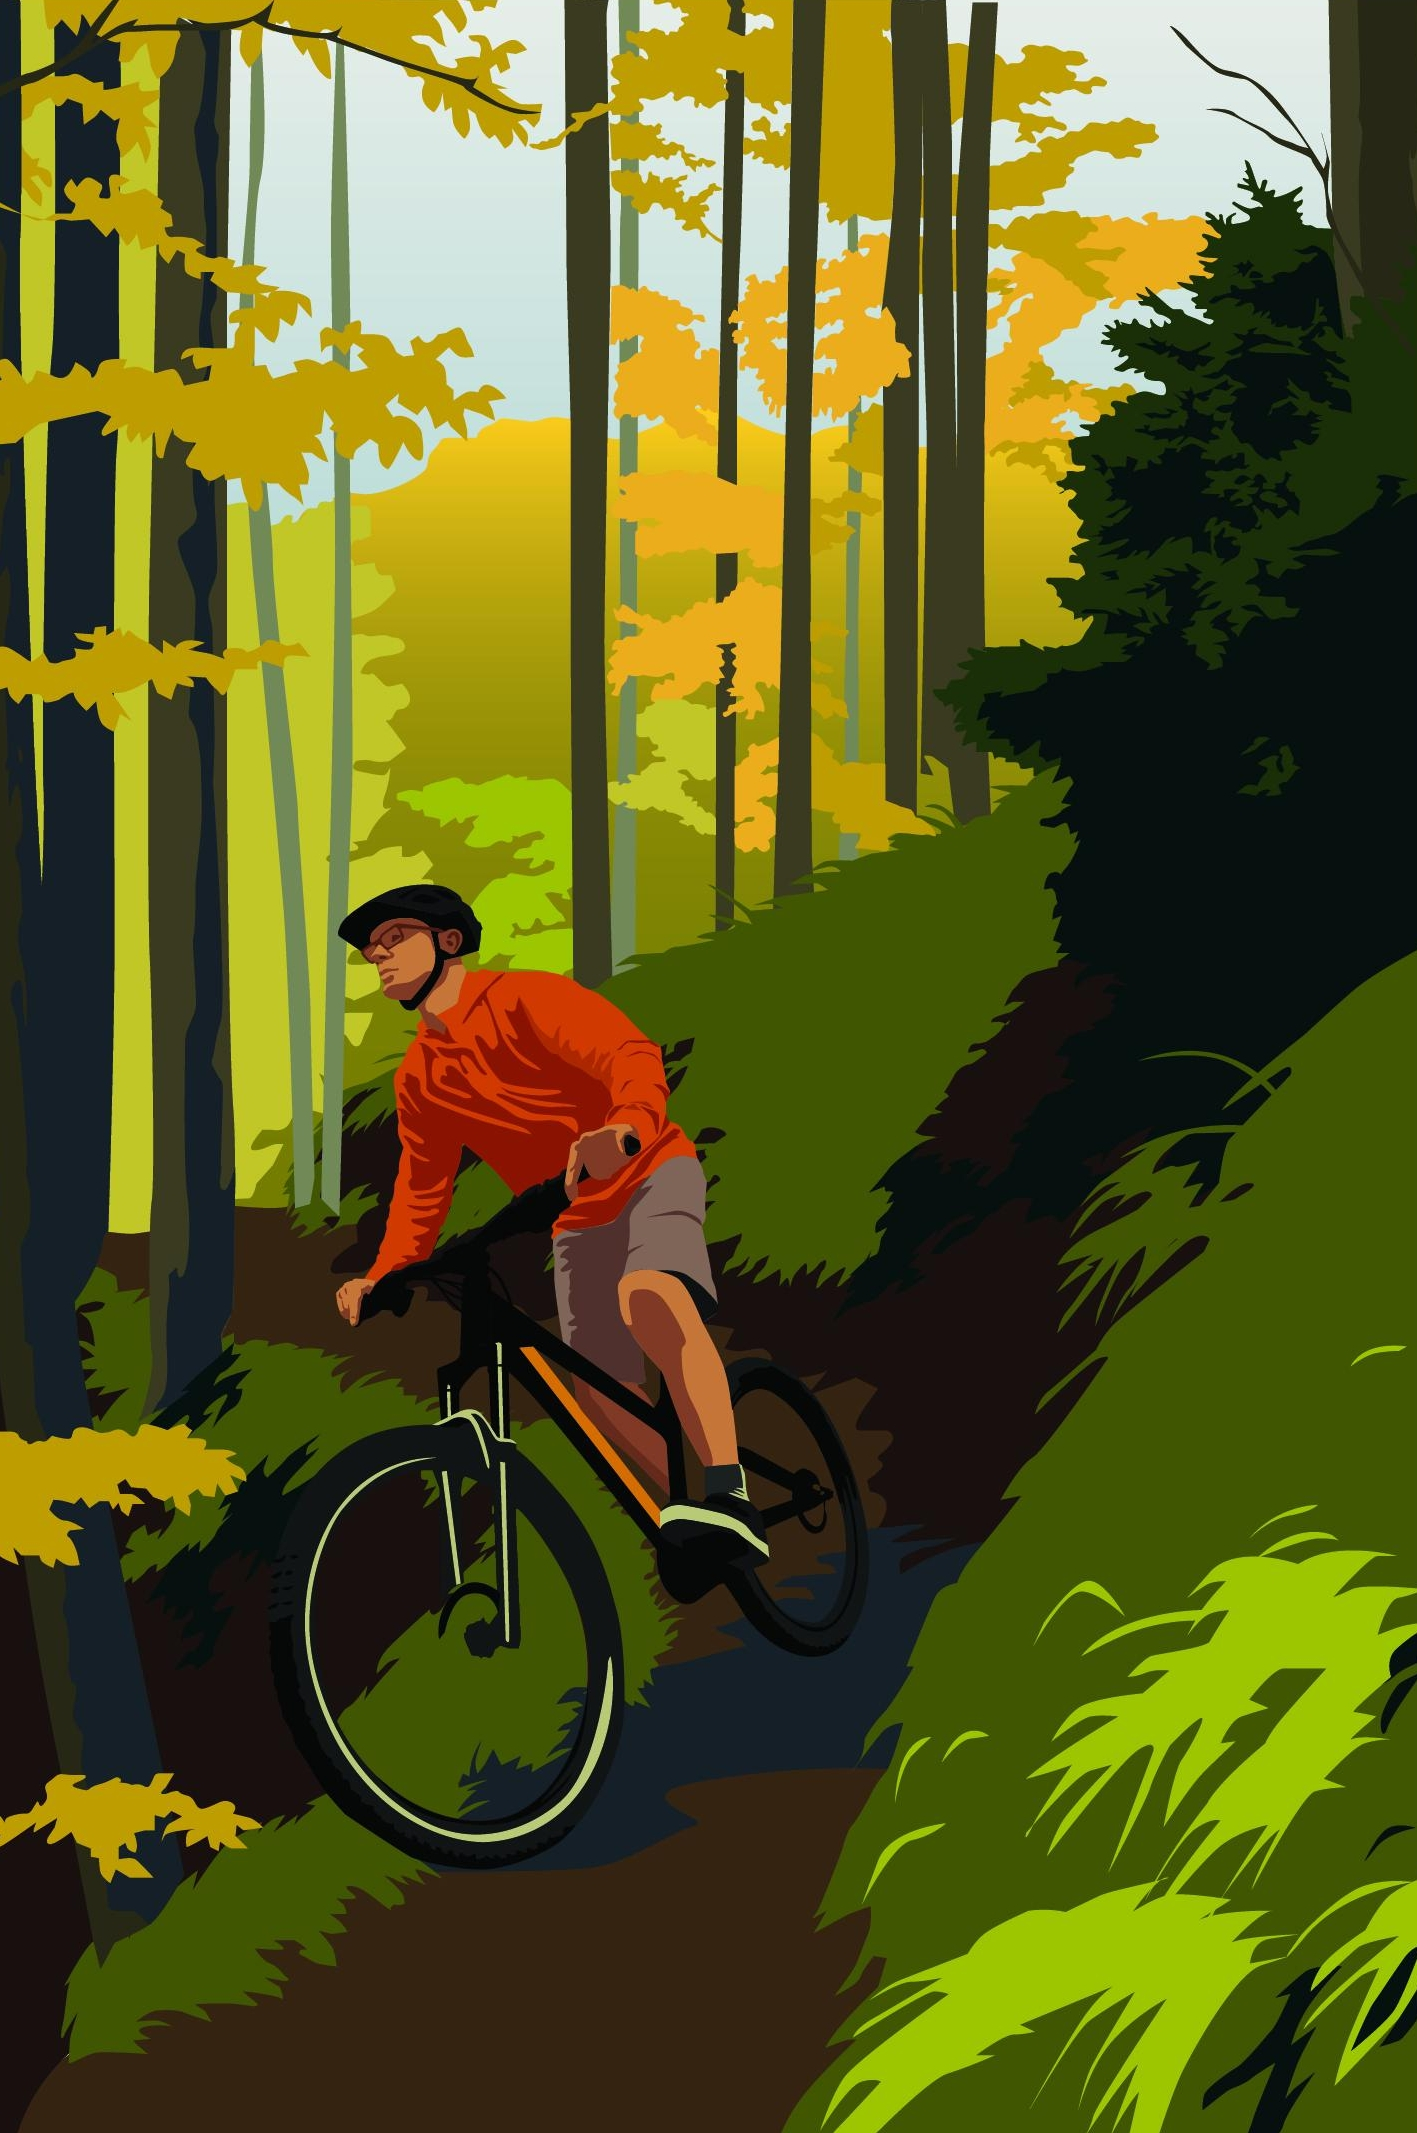 Mtn Biking art final.jpg